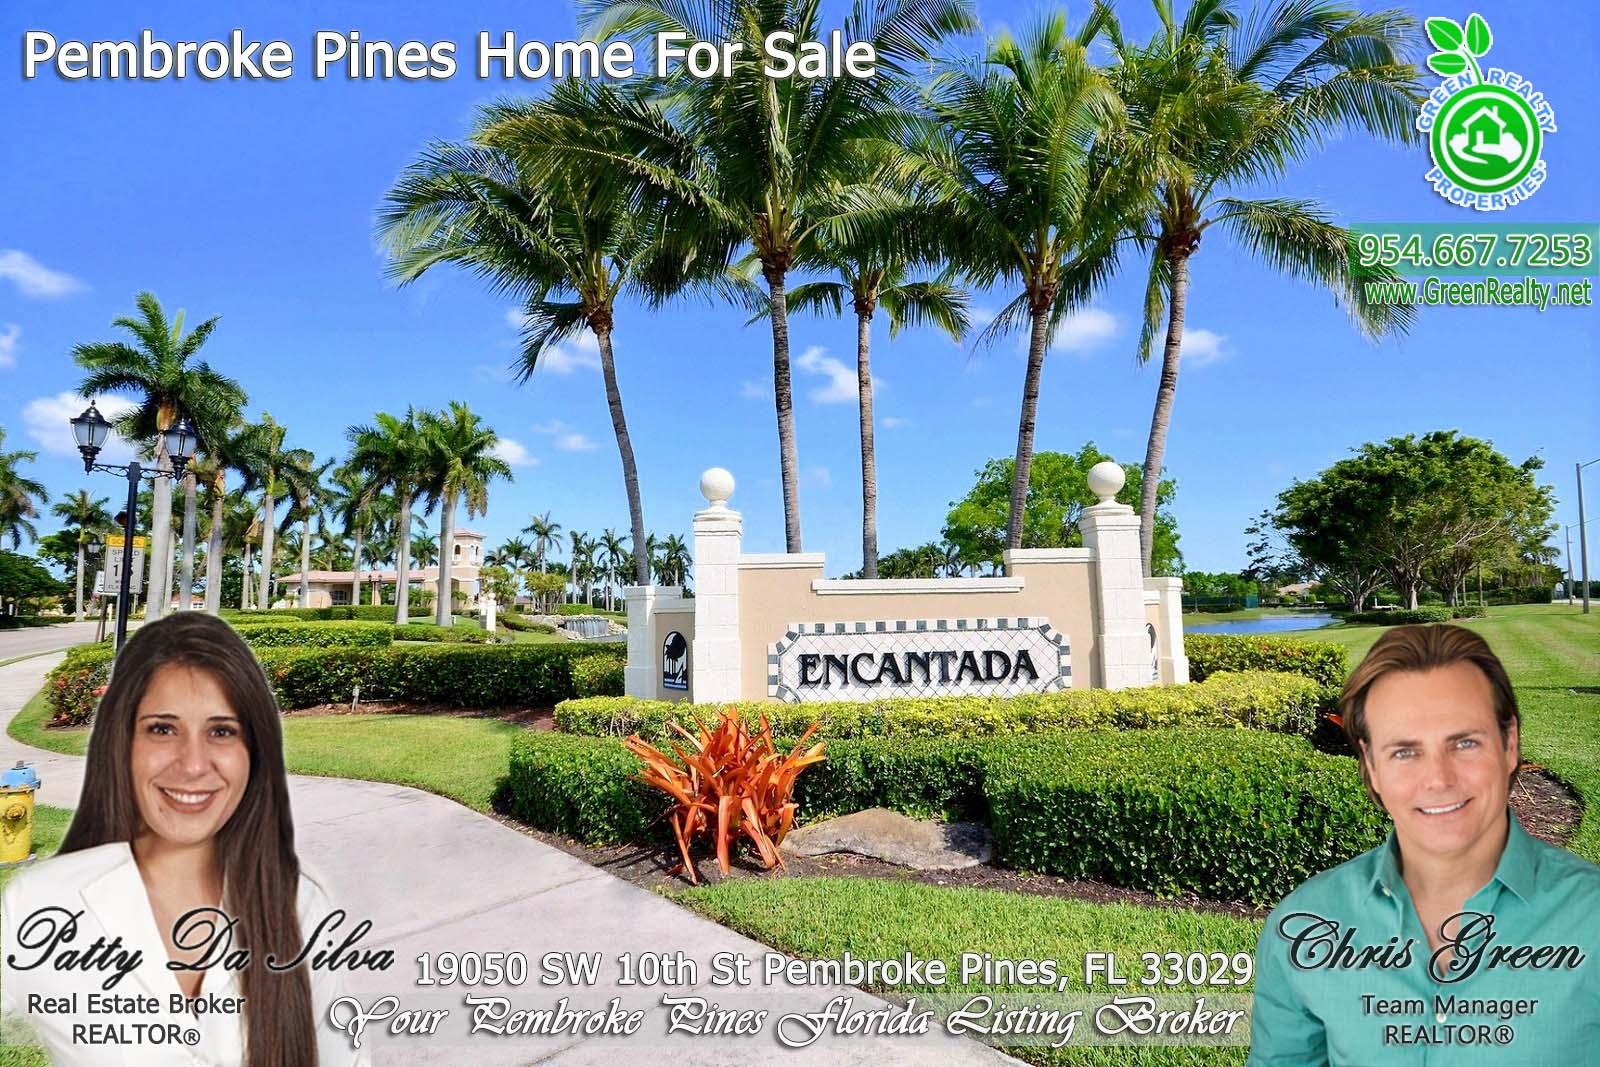 34 Encantada Homes For Sale - Main Entrance (1)